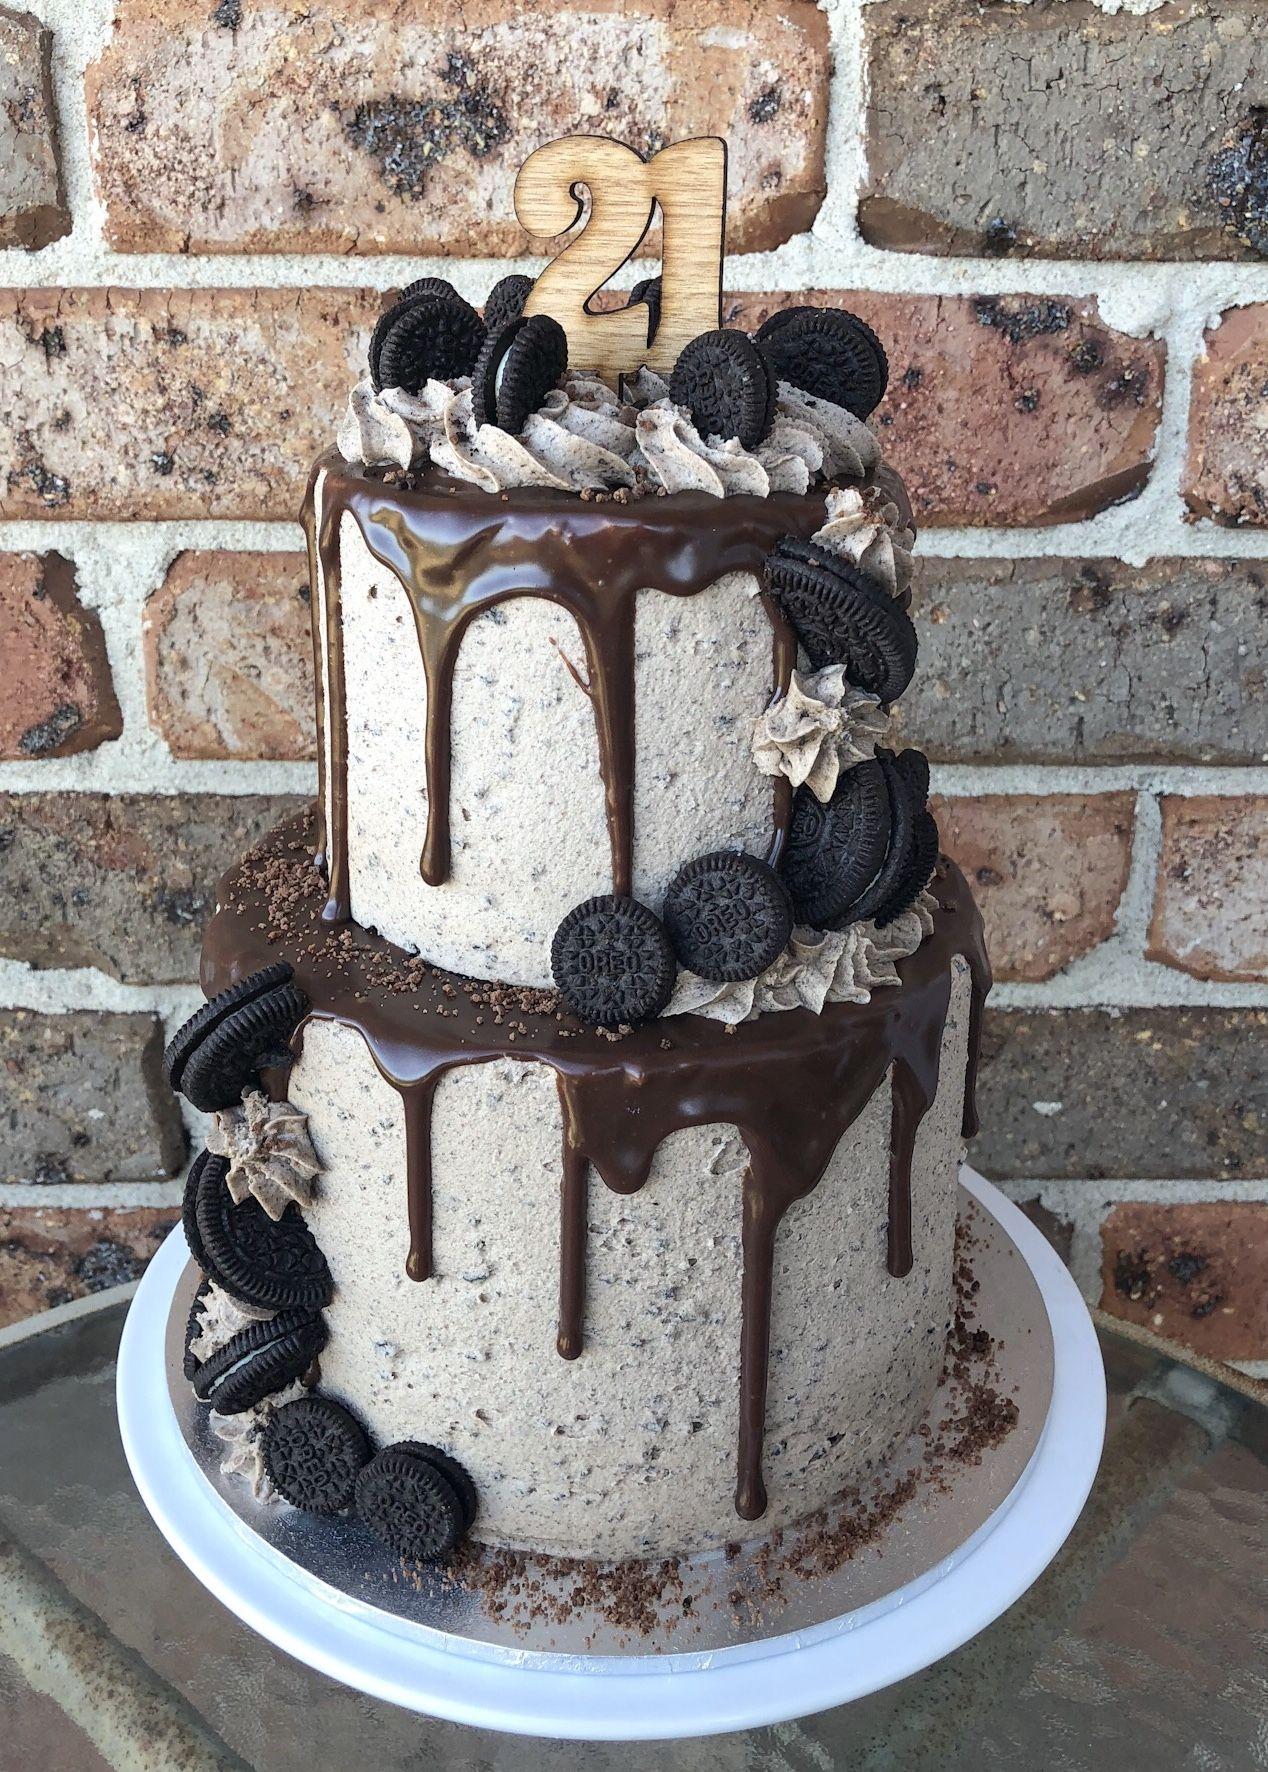 Phenomenal 2 Tier Oreo Drip Cake Oreo Cake Recipes Funny Birthday Cards Online Kookostrdamsfinfo